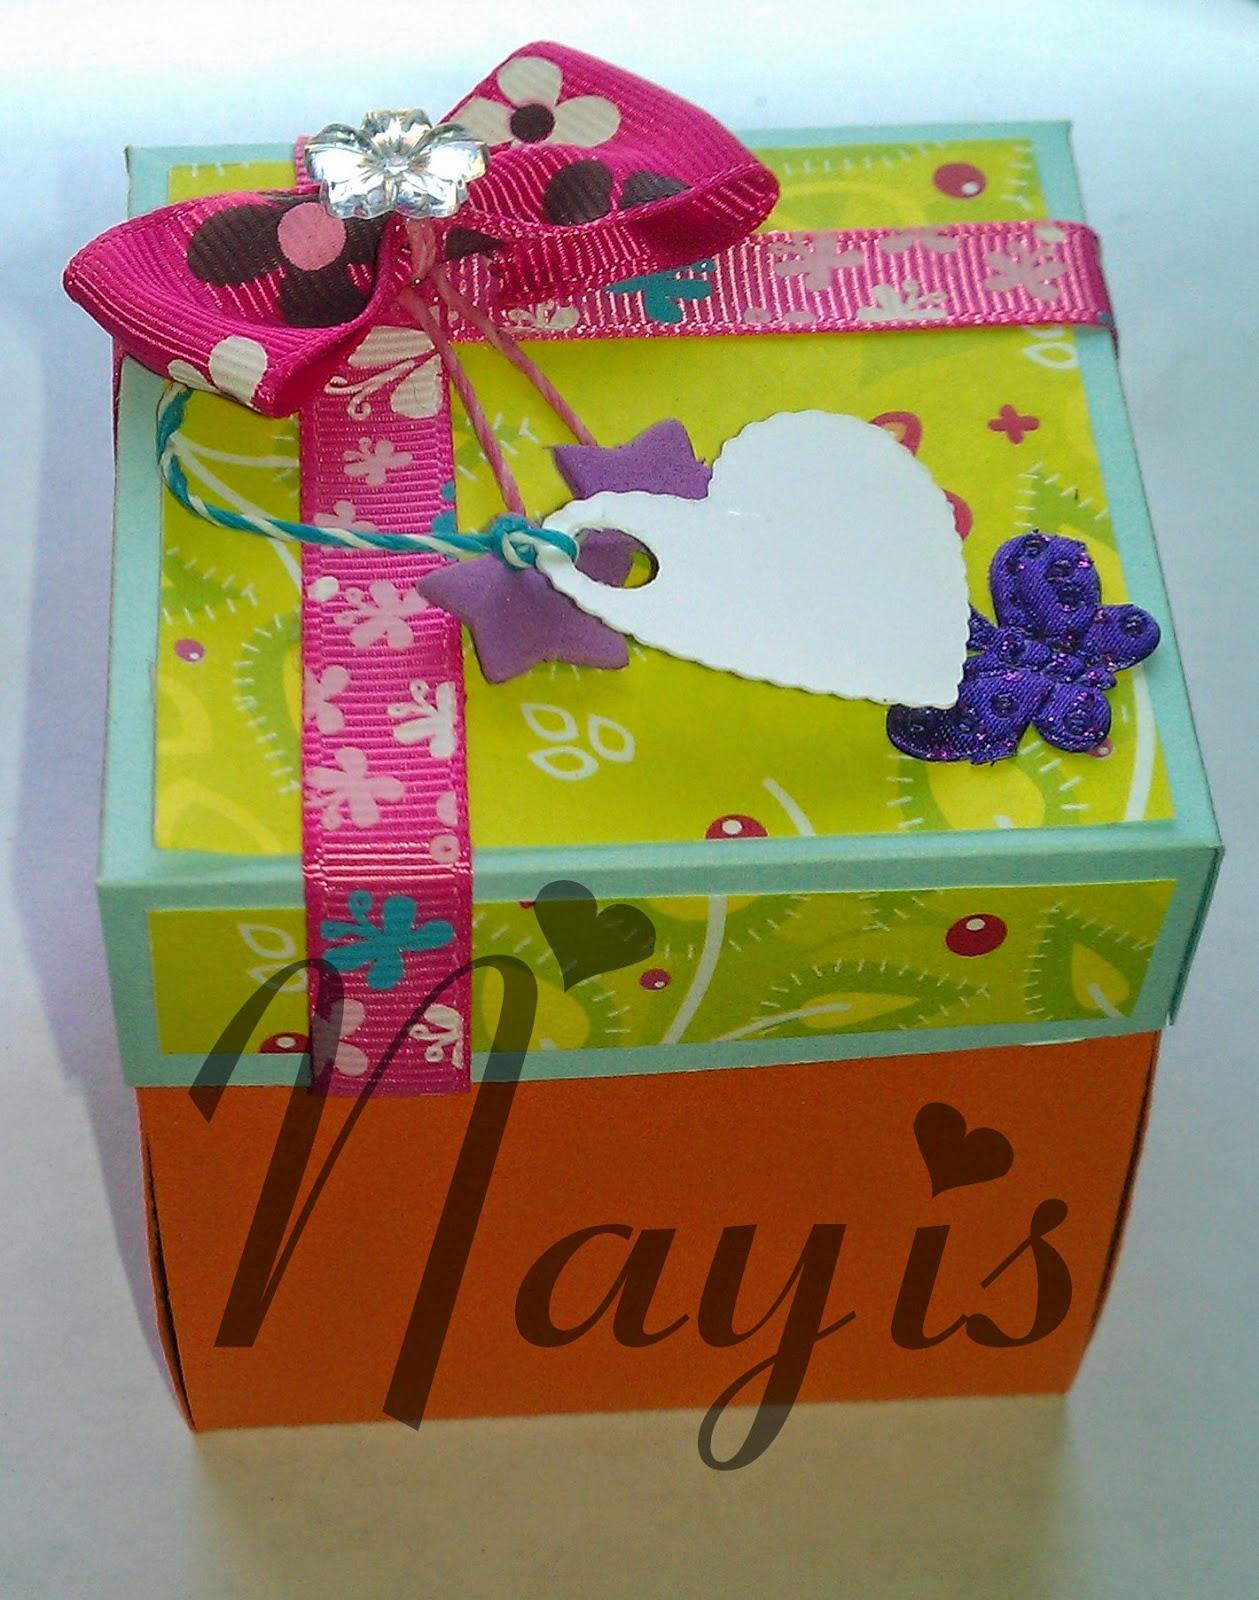 explosion box happy birthday cajita explosiva cumpleaños